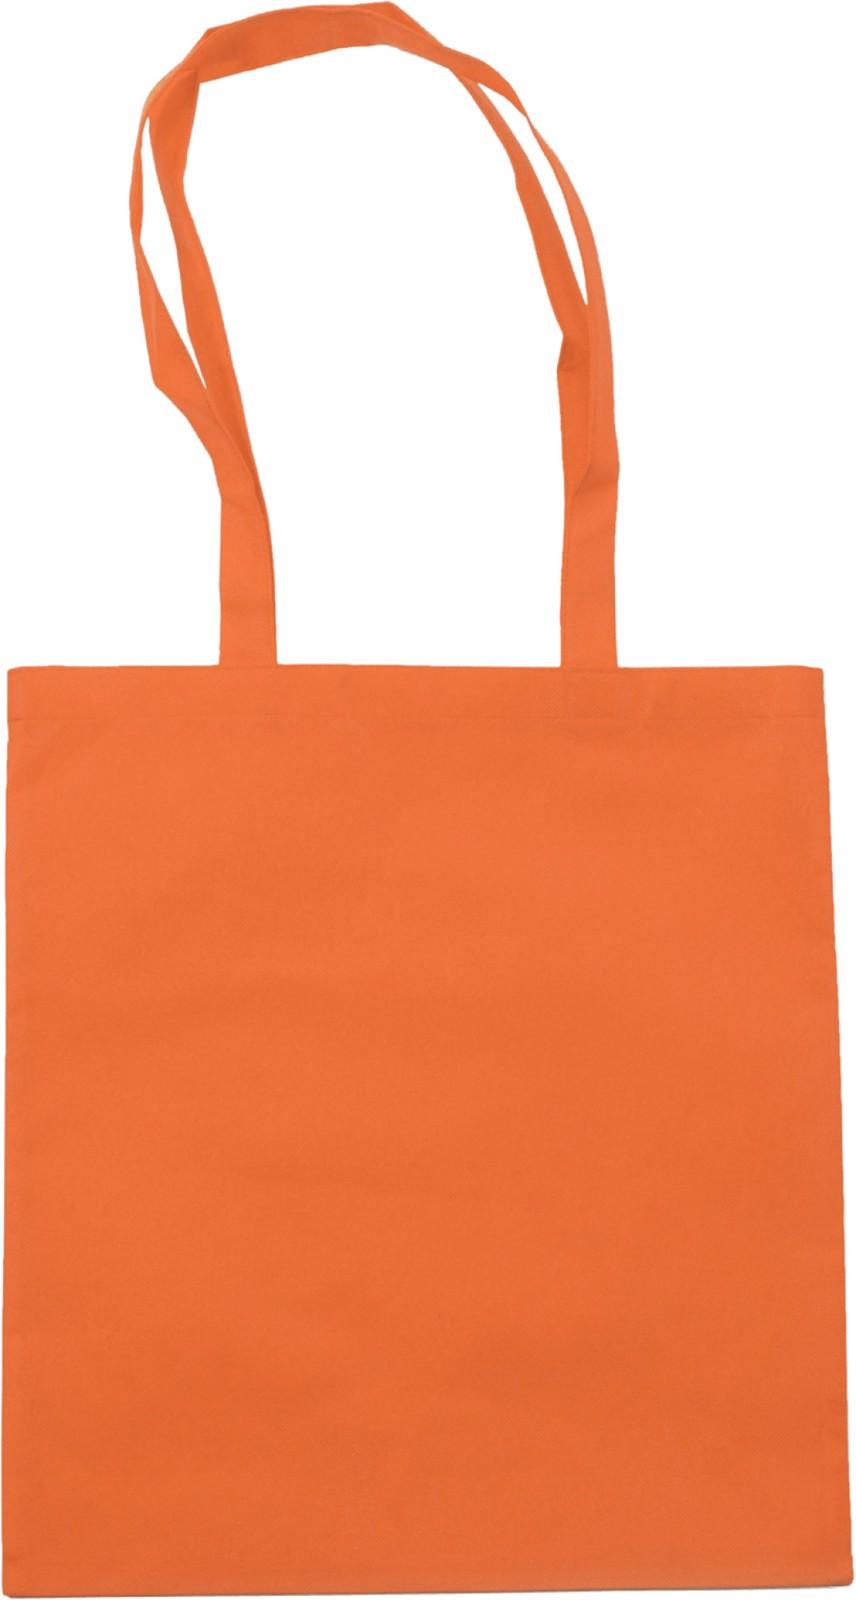 Nonwoven (80 gr/m²) shopping bag - Orange